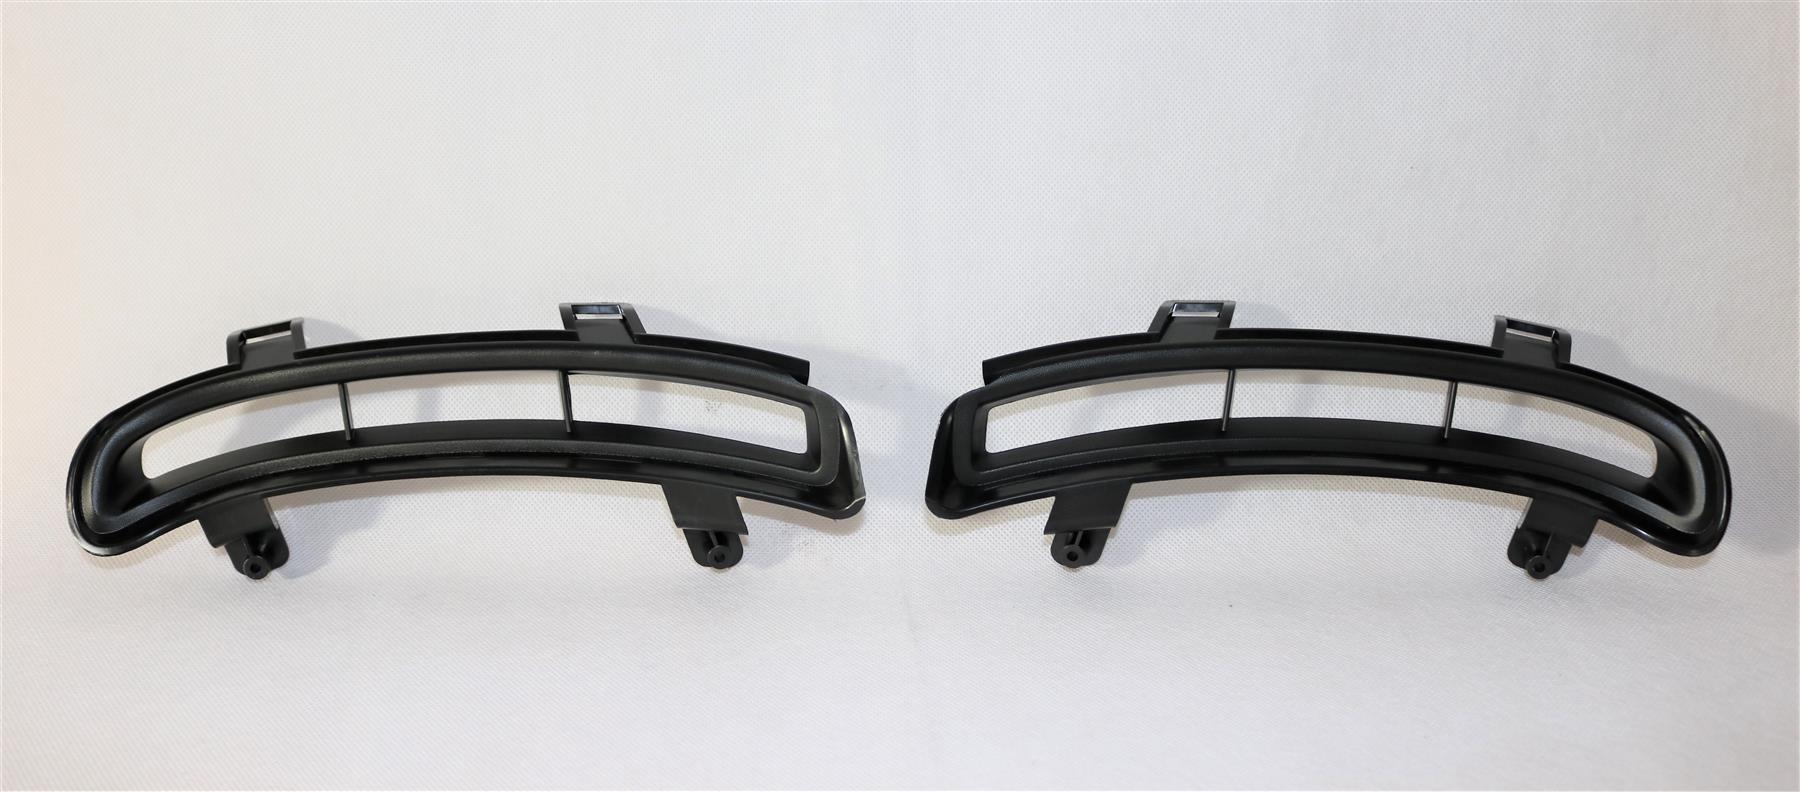 pair Genuine 7429J9 Citroen DS3 Front Daylight running lamp bracket set DLR